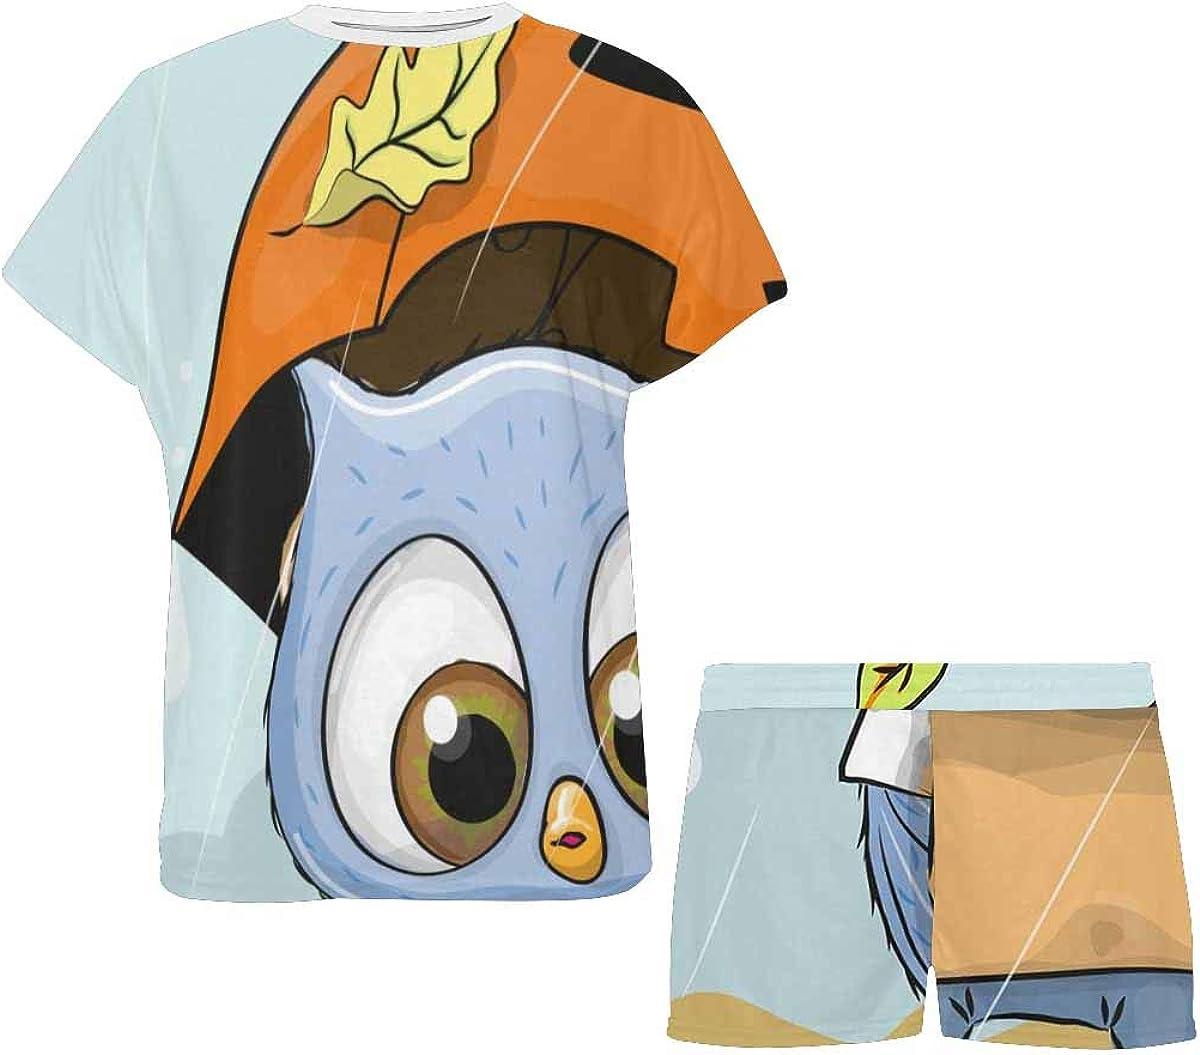 INTERESTPRINT Owls with Umbrella Under The Rain Women's Short Sleeve Breathable Sleepwear Two Piece Pajama Set